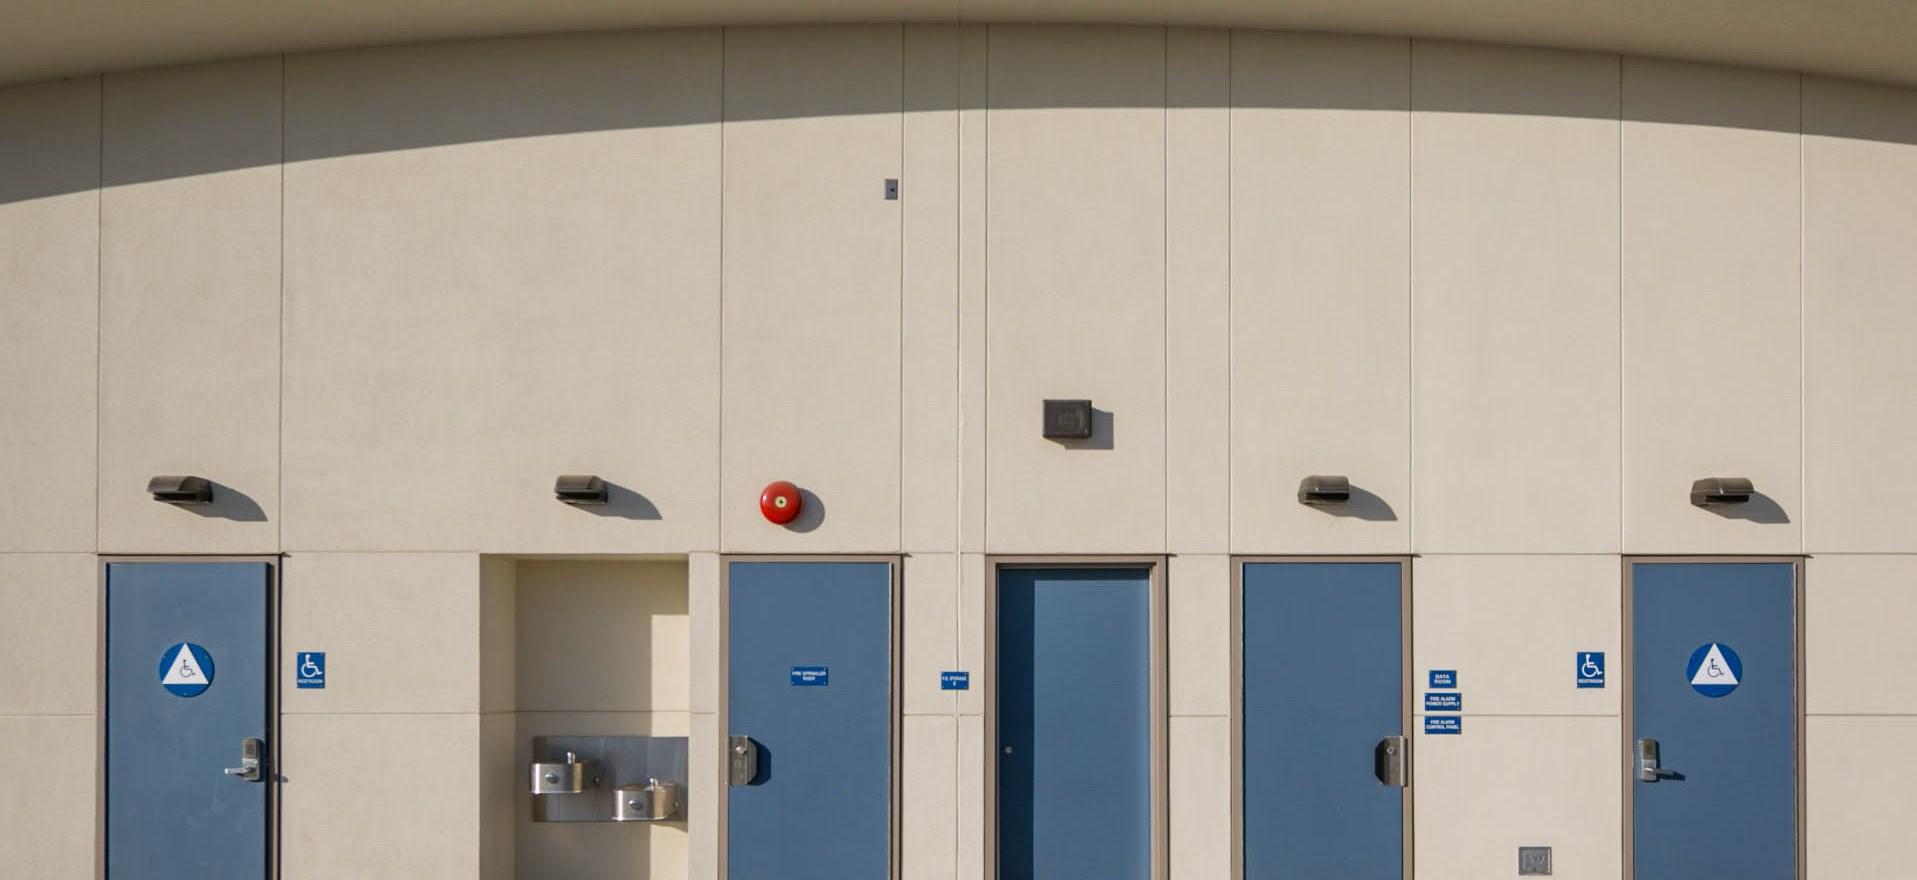 JTSModular-WhitleyElementarySchool-RobRijnenPhotography (19 of 36)